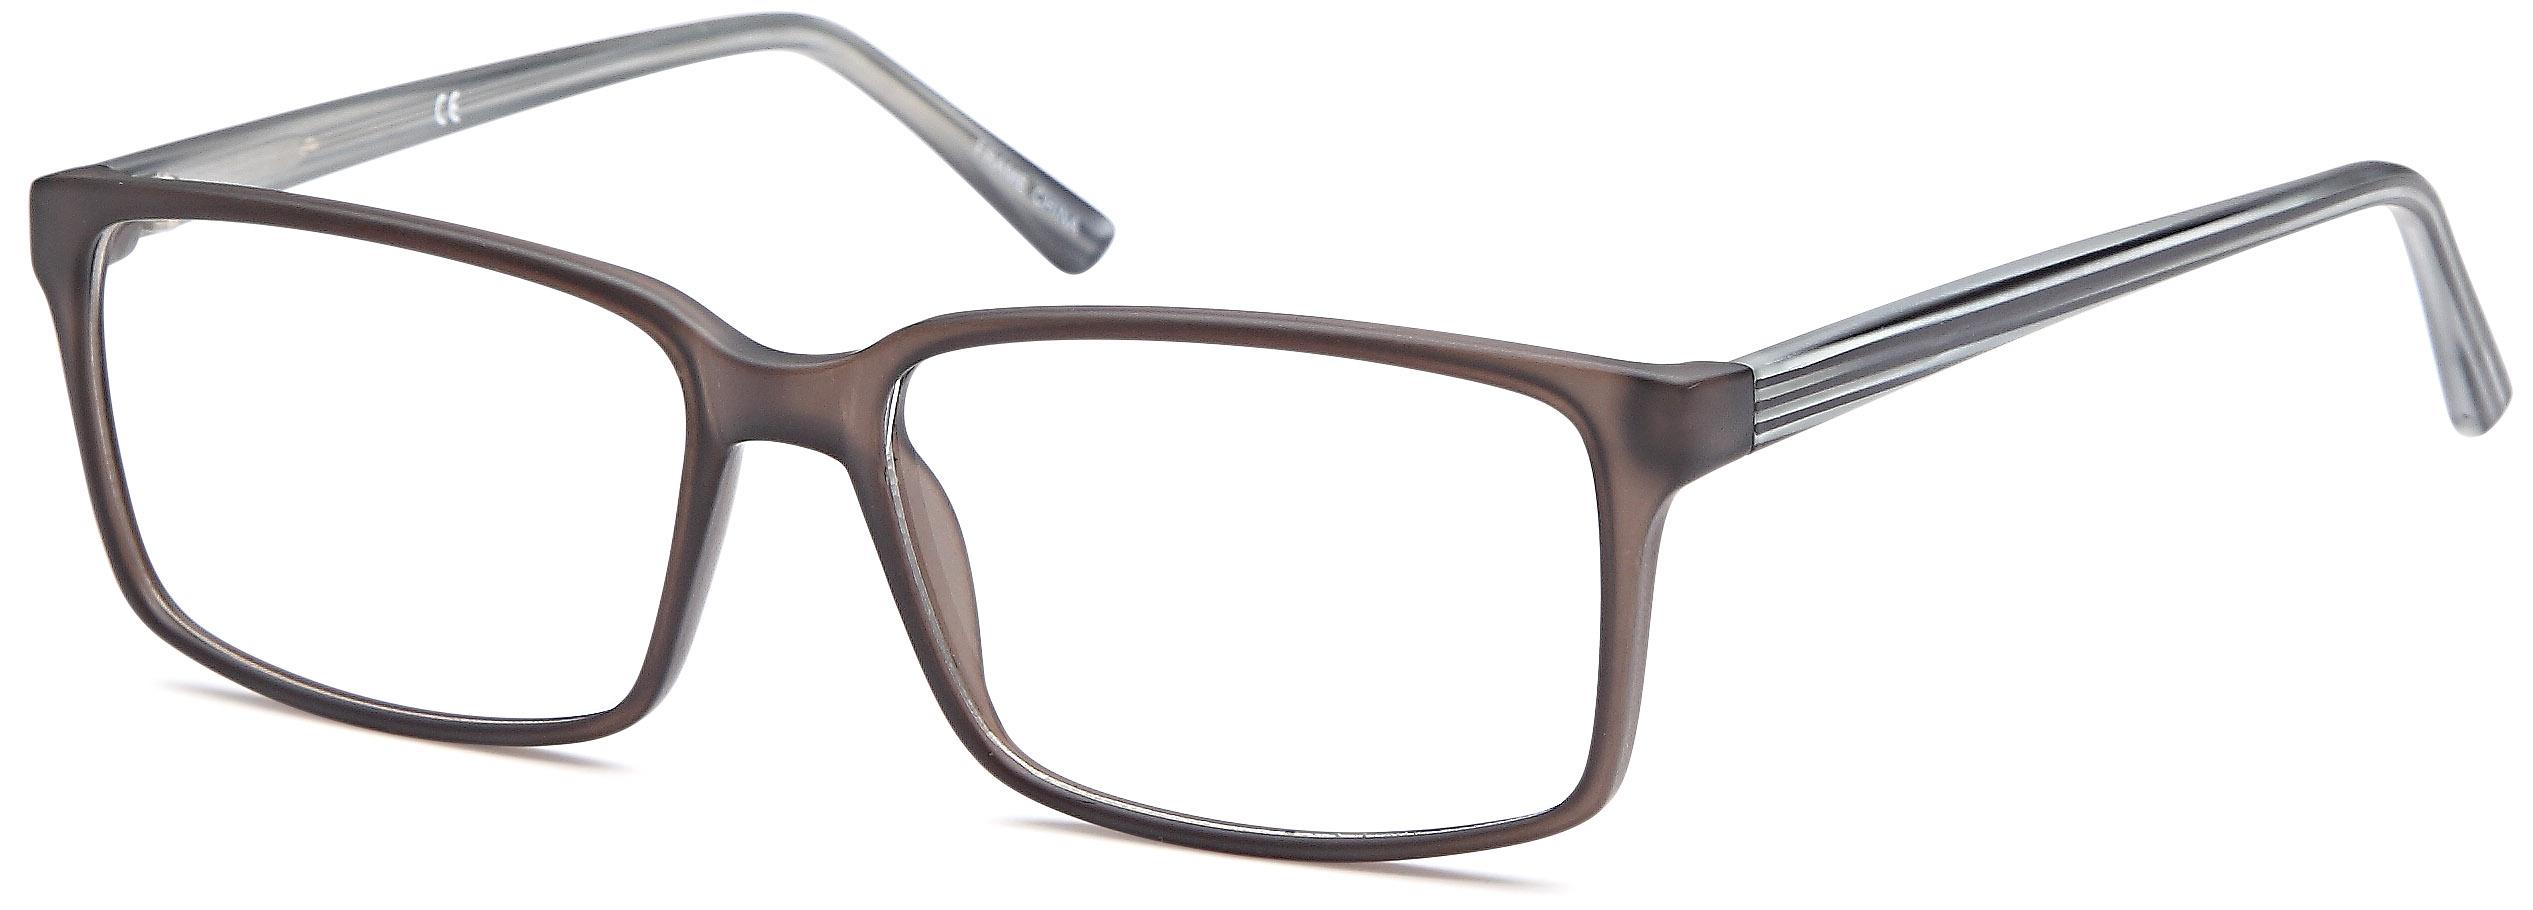 Glasses Frames Crystal Matte : DALIX Womens Eyeglasses Frames 60-16-145-39 RXable in ...